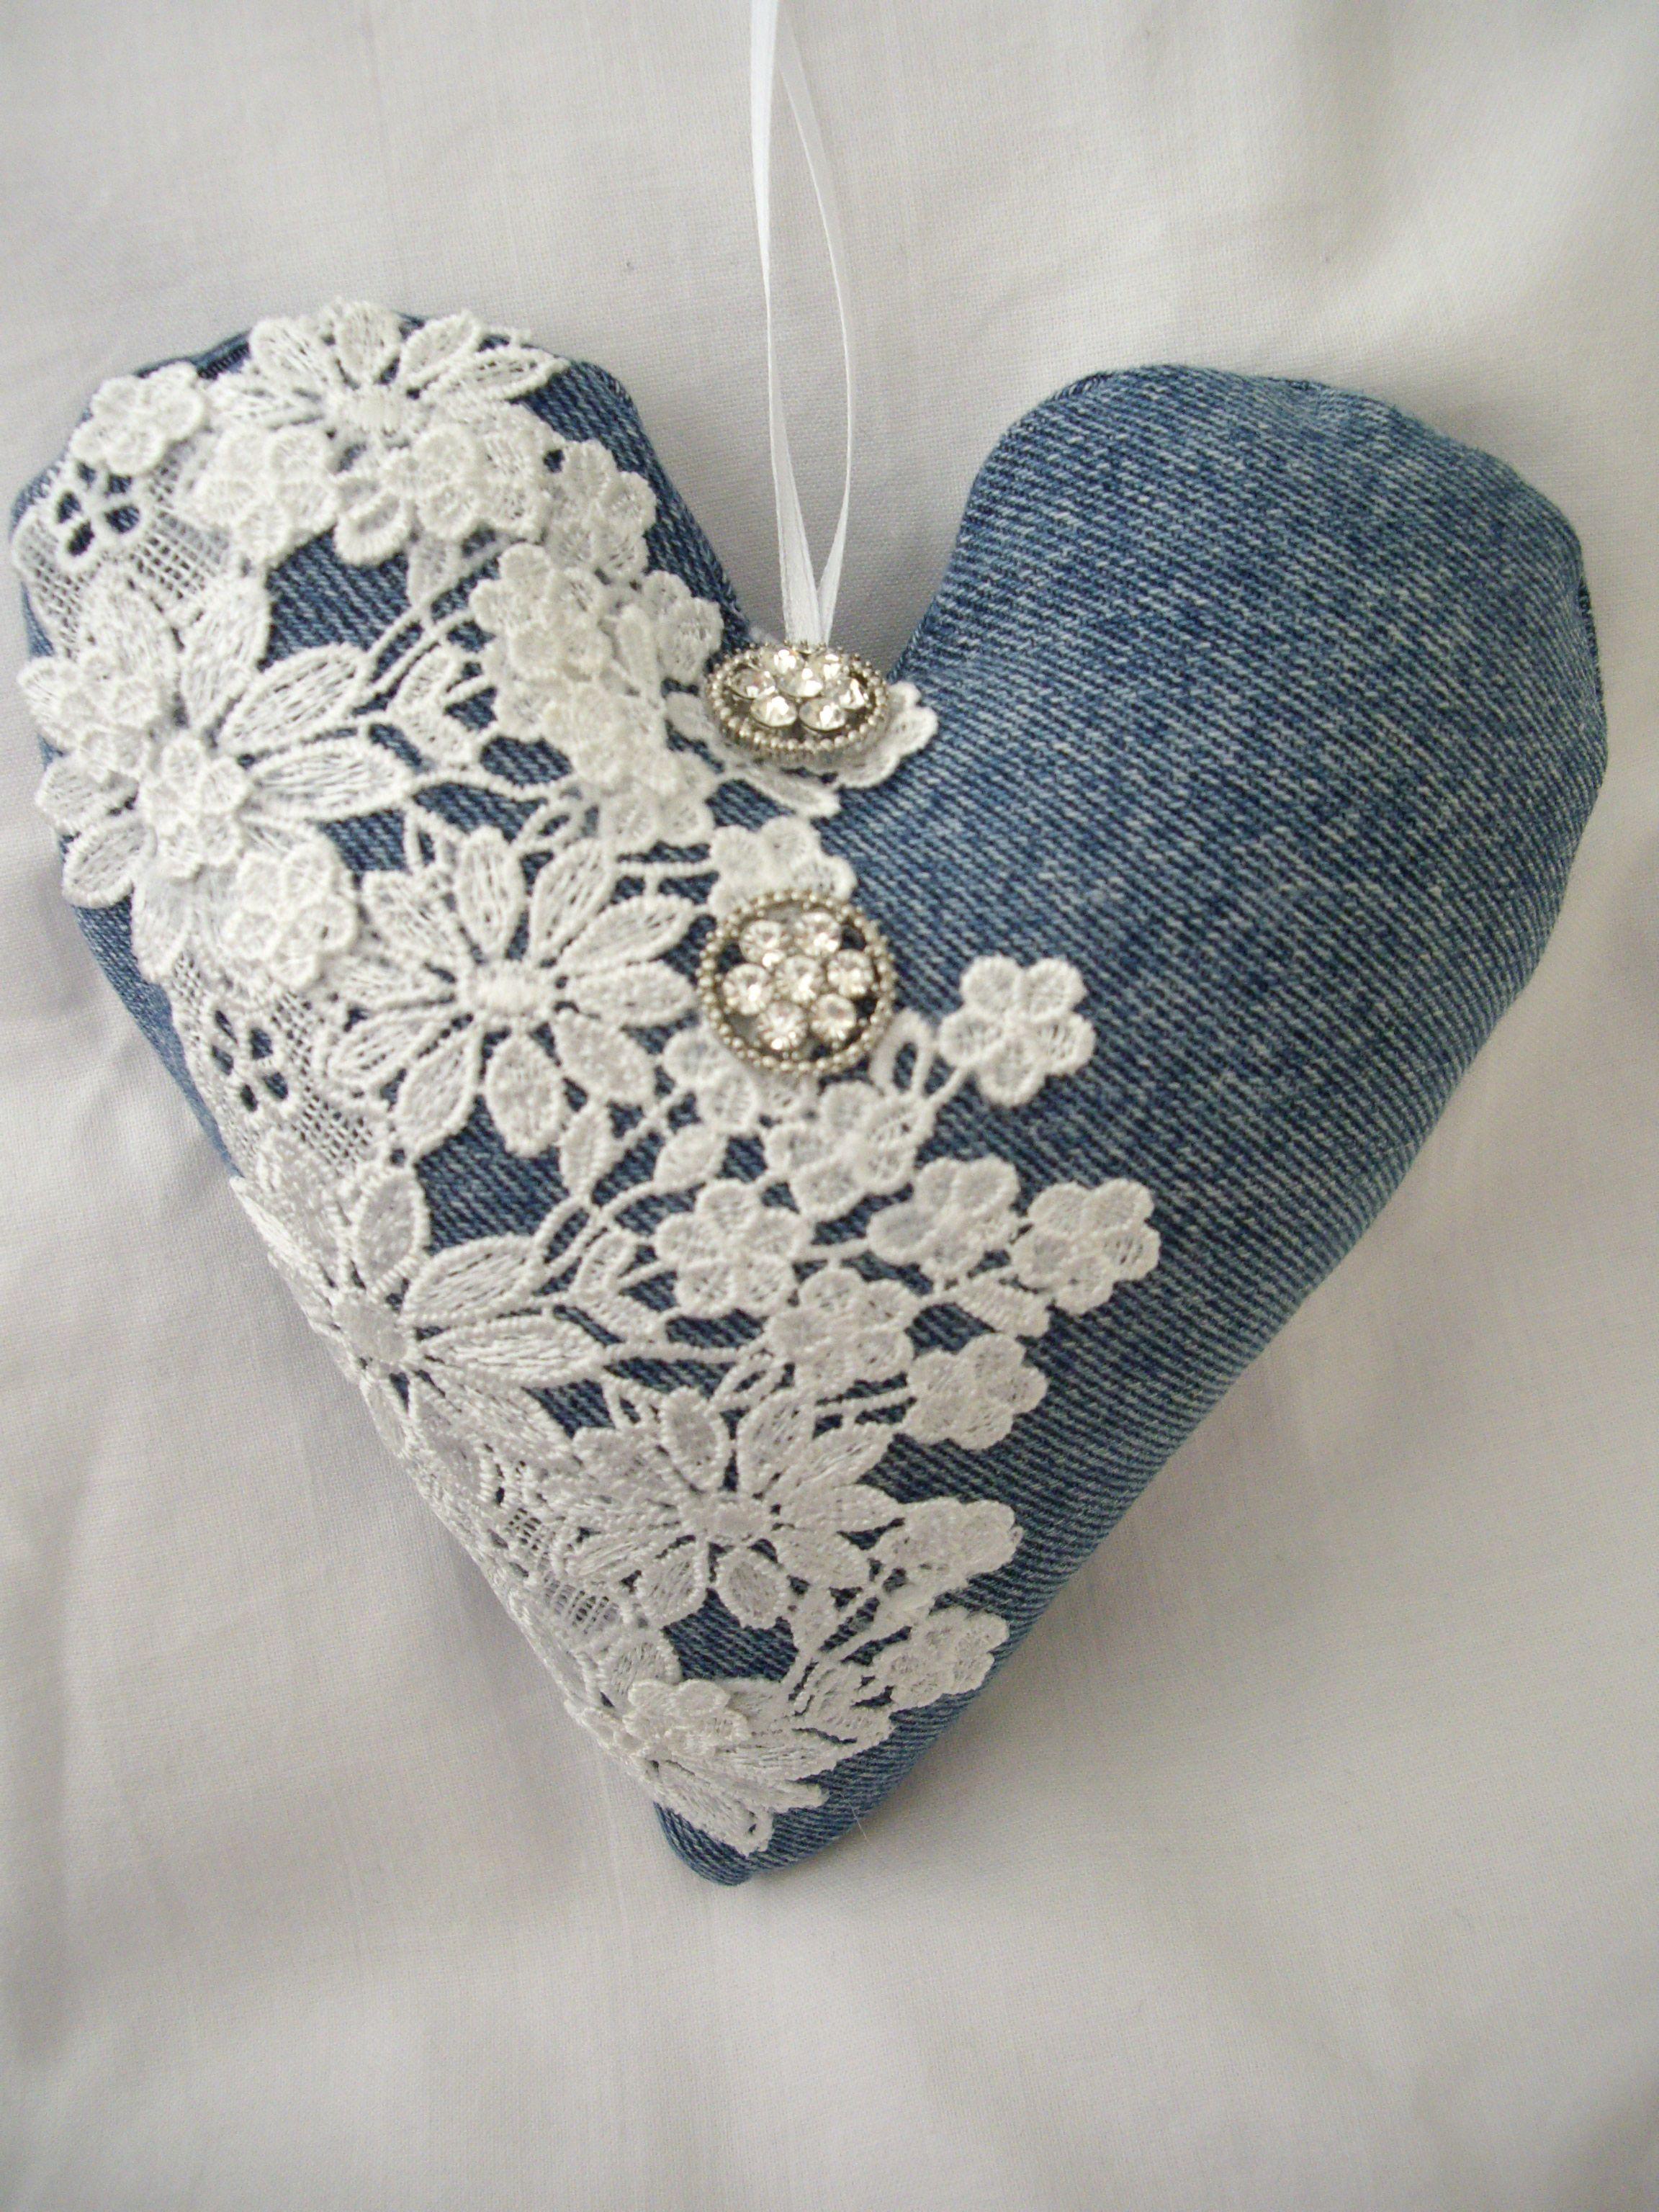 Patricia starks hearts pinterest craft